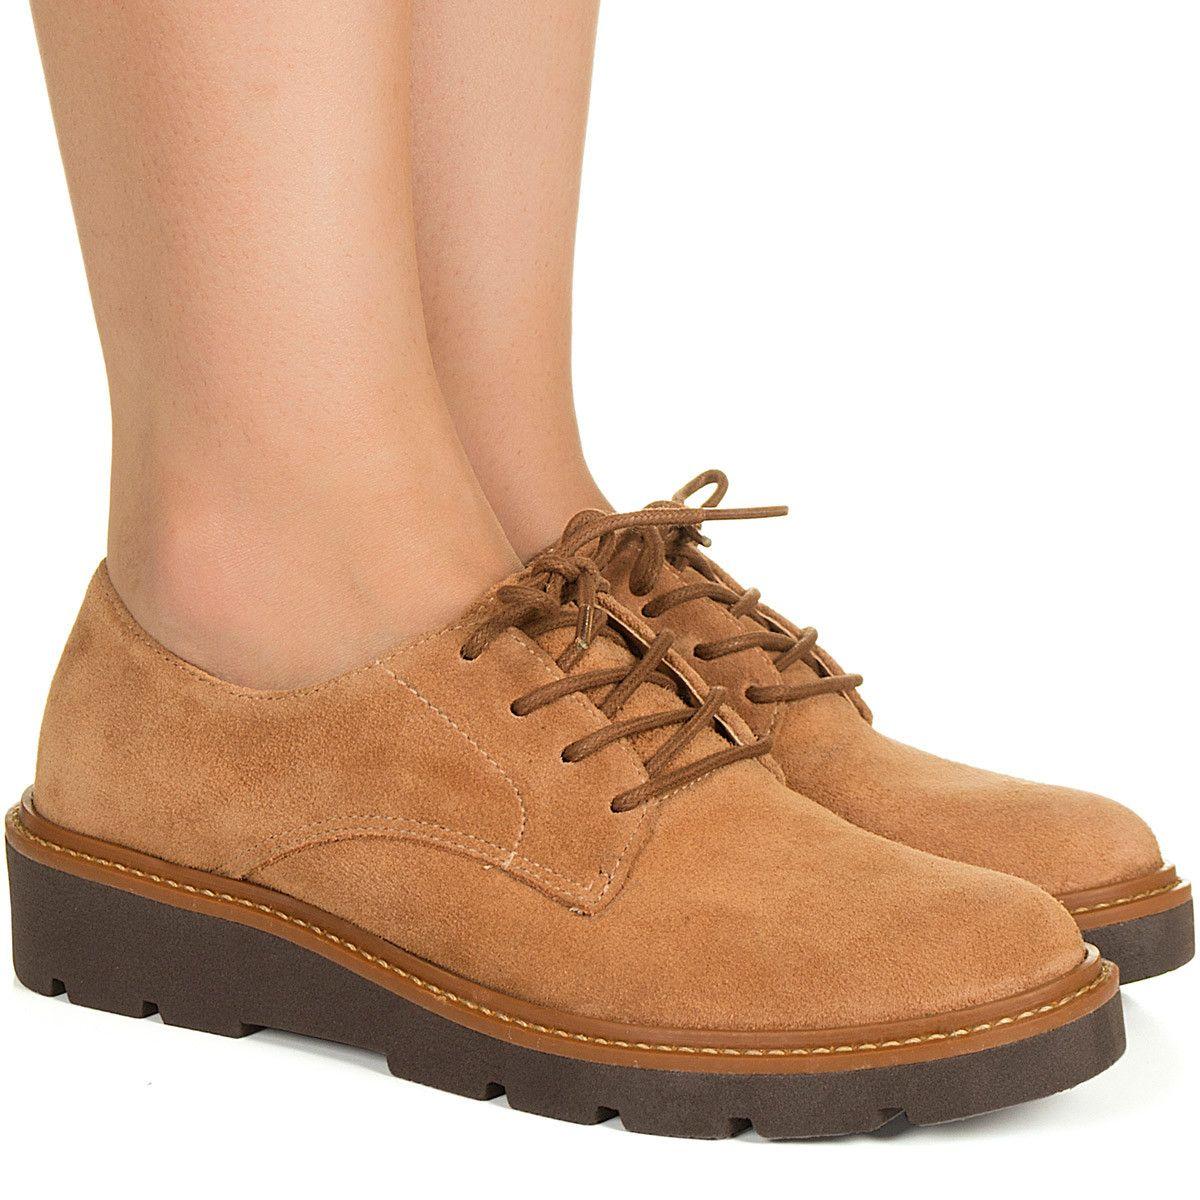 98d027e76 Sapato marrom com cadarço Taquilla Sapato Marrom